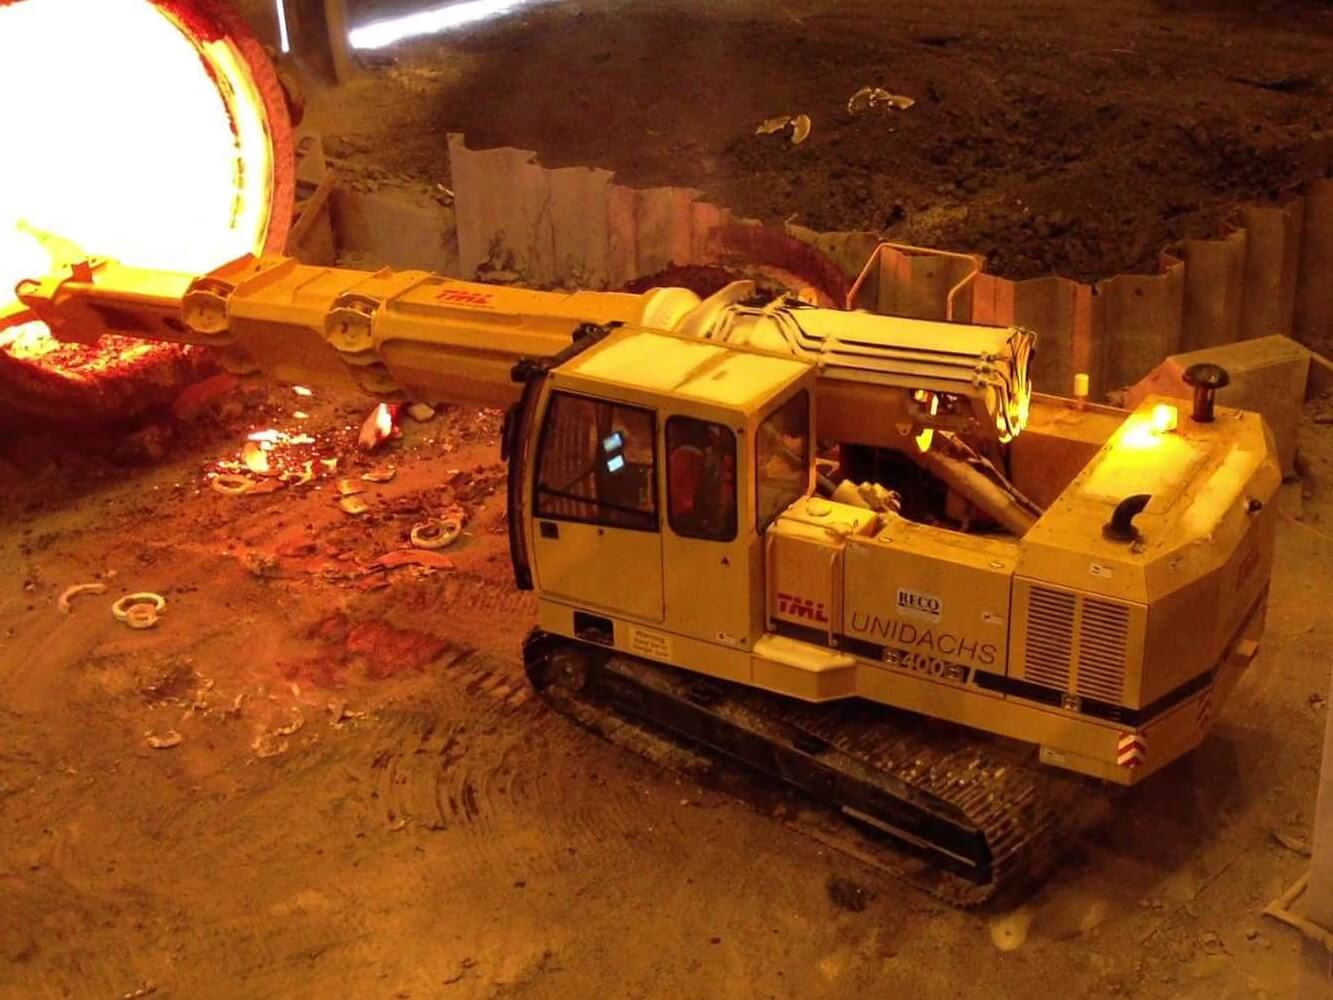 tml-dipromet- maquinaria-mineria-unidachs400